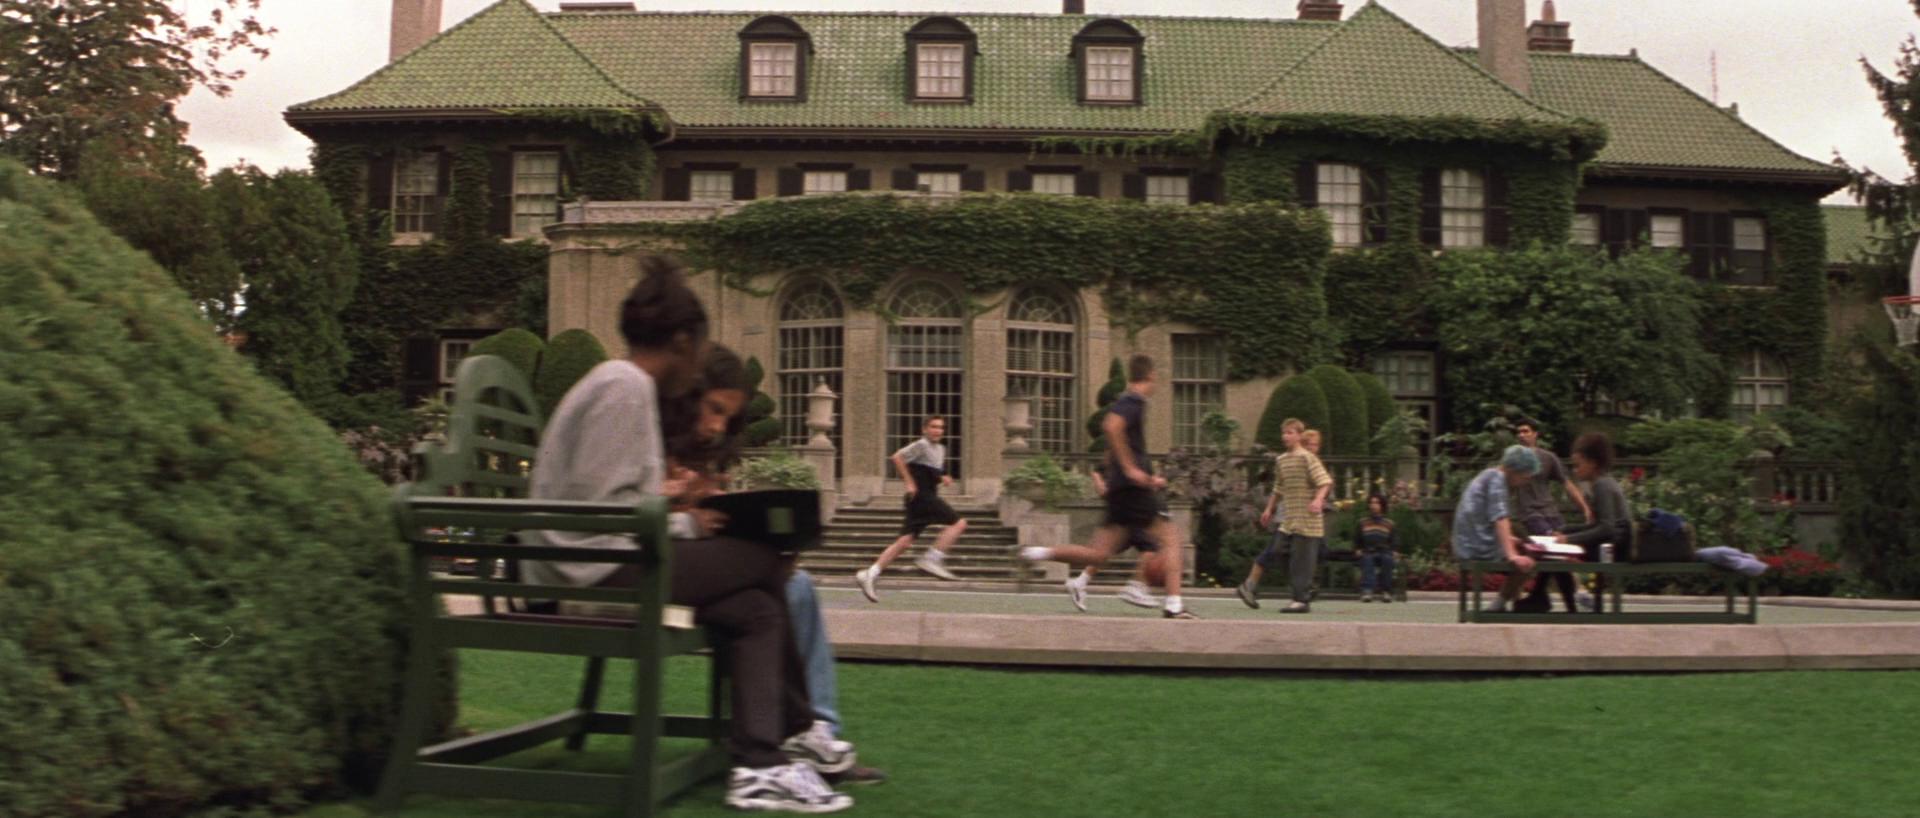 Image - X-Mansion Exterior (Parkwood Estate).png | X-Men Movies Wiki ...